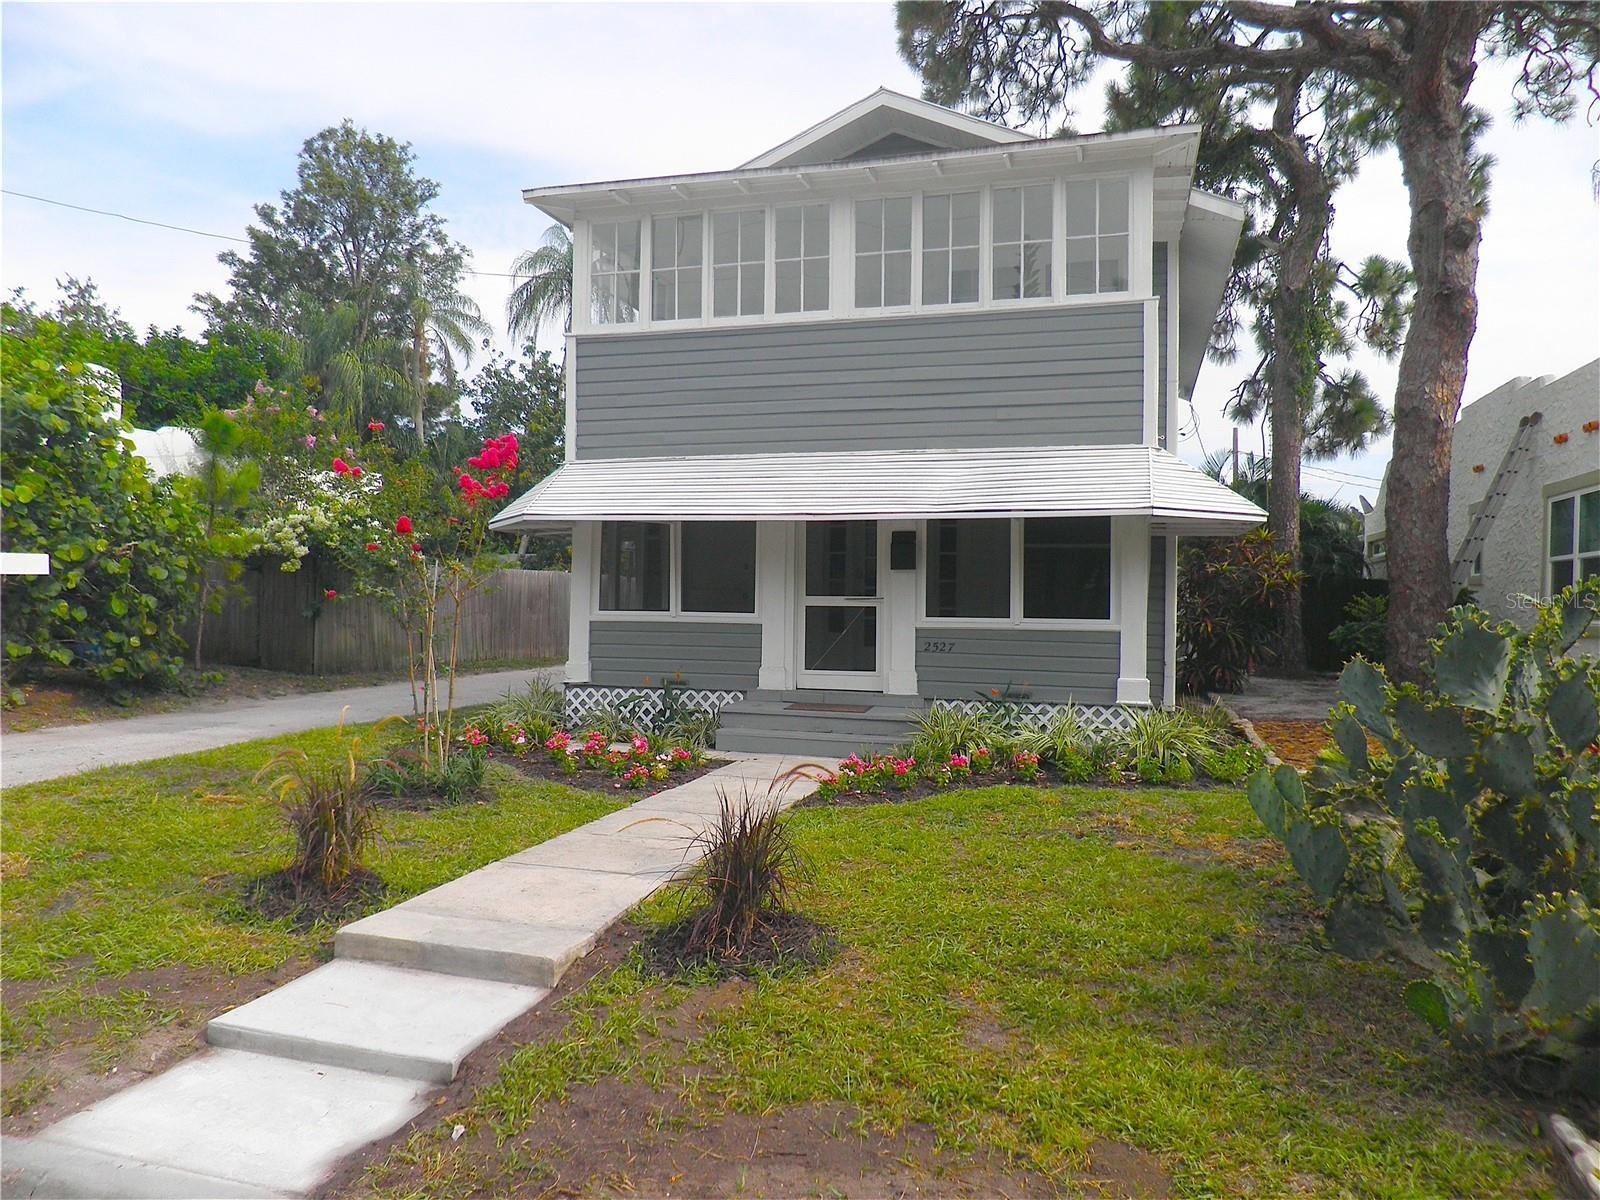 2527 11TH AVENUE W, Bradenton, FL 34205 - #: A4503481